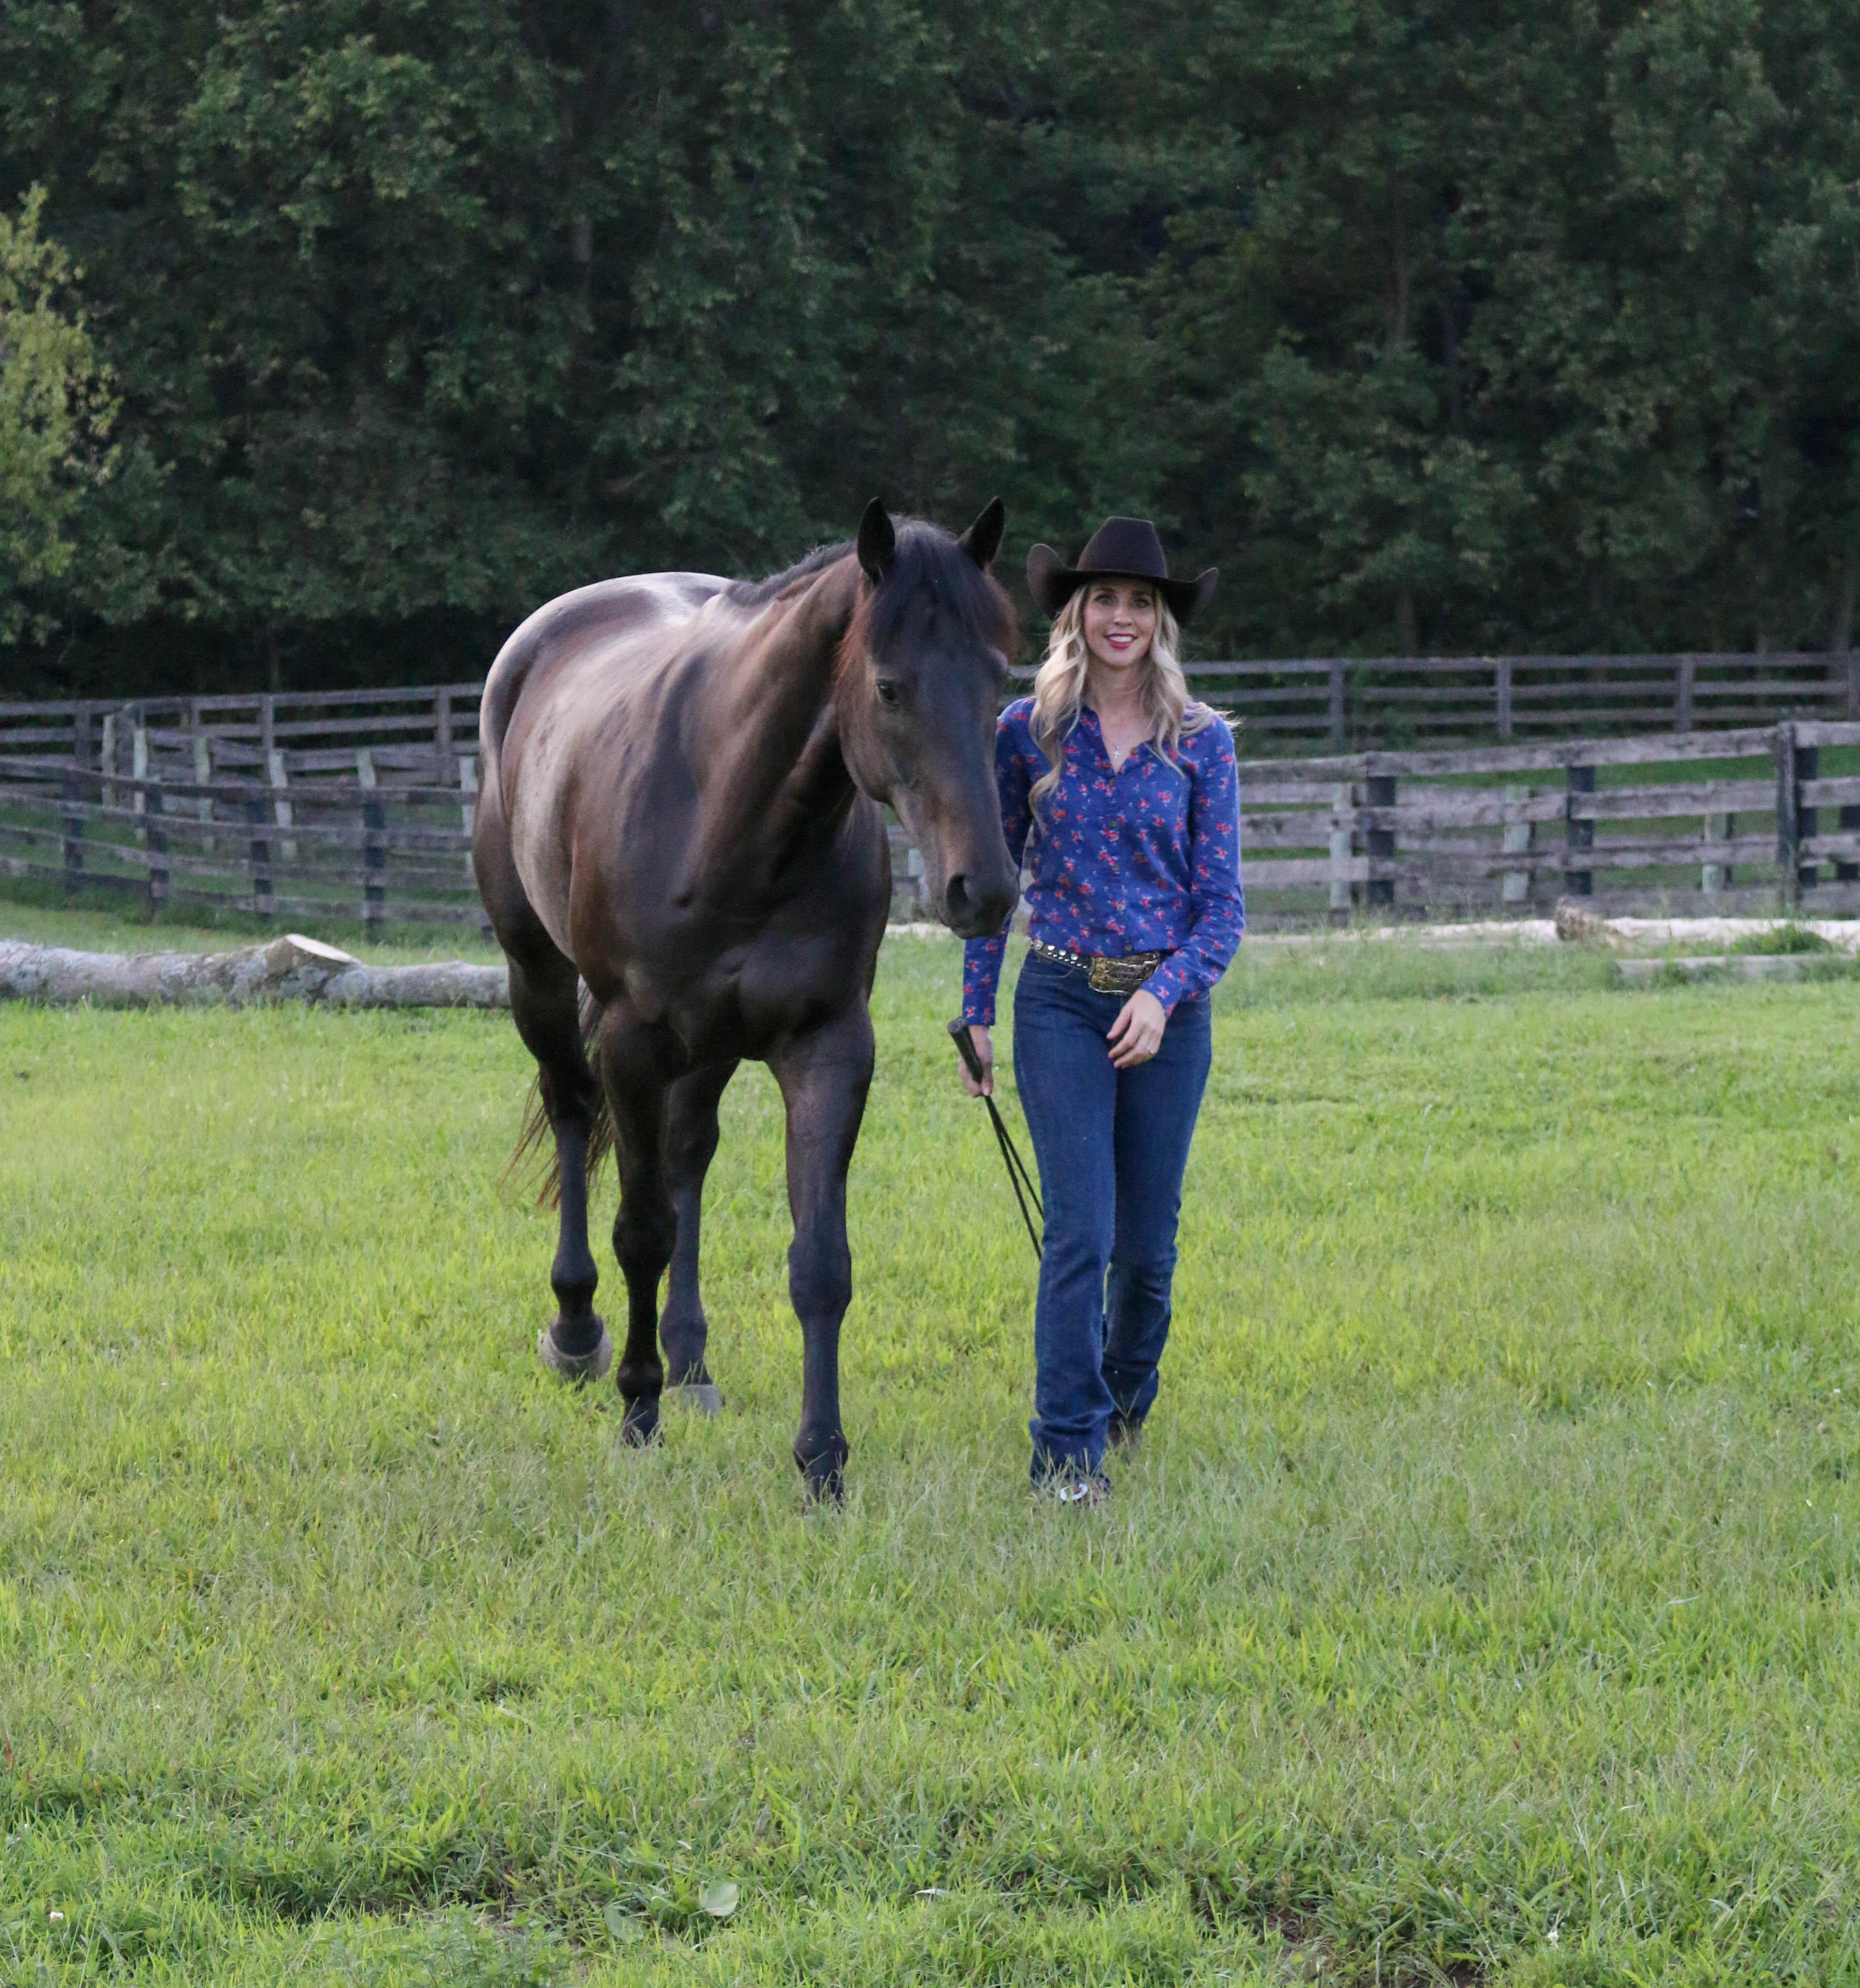 Elizabeth James, Ph.D., with her horse, Ozzie. (Photo by Dan James)